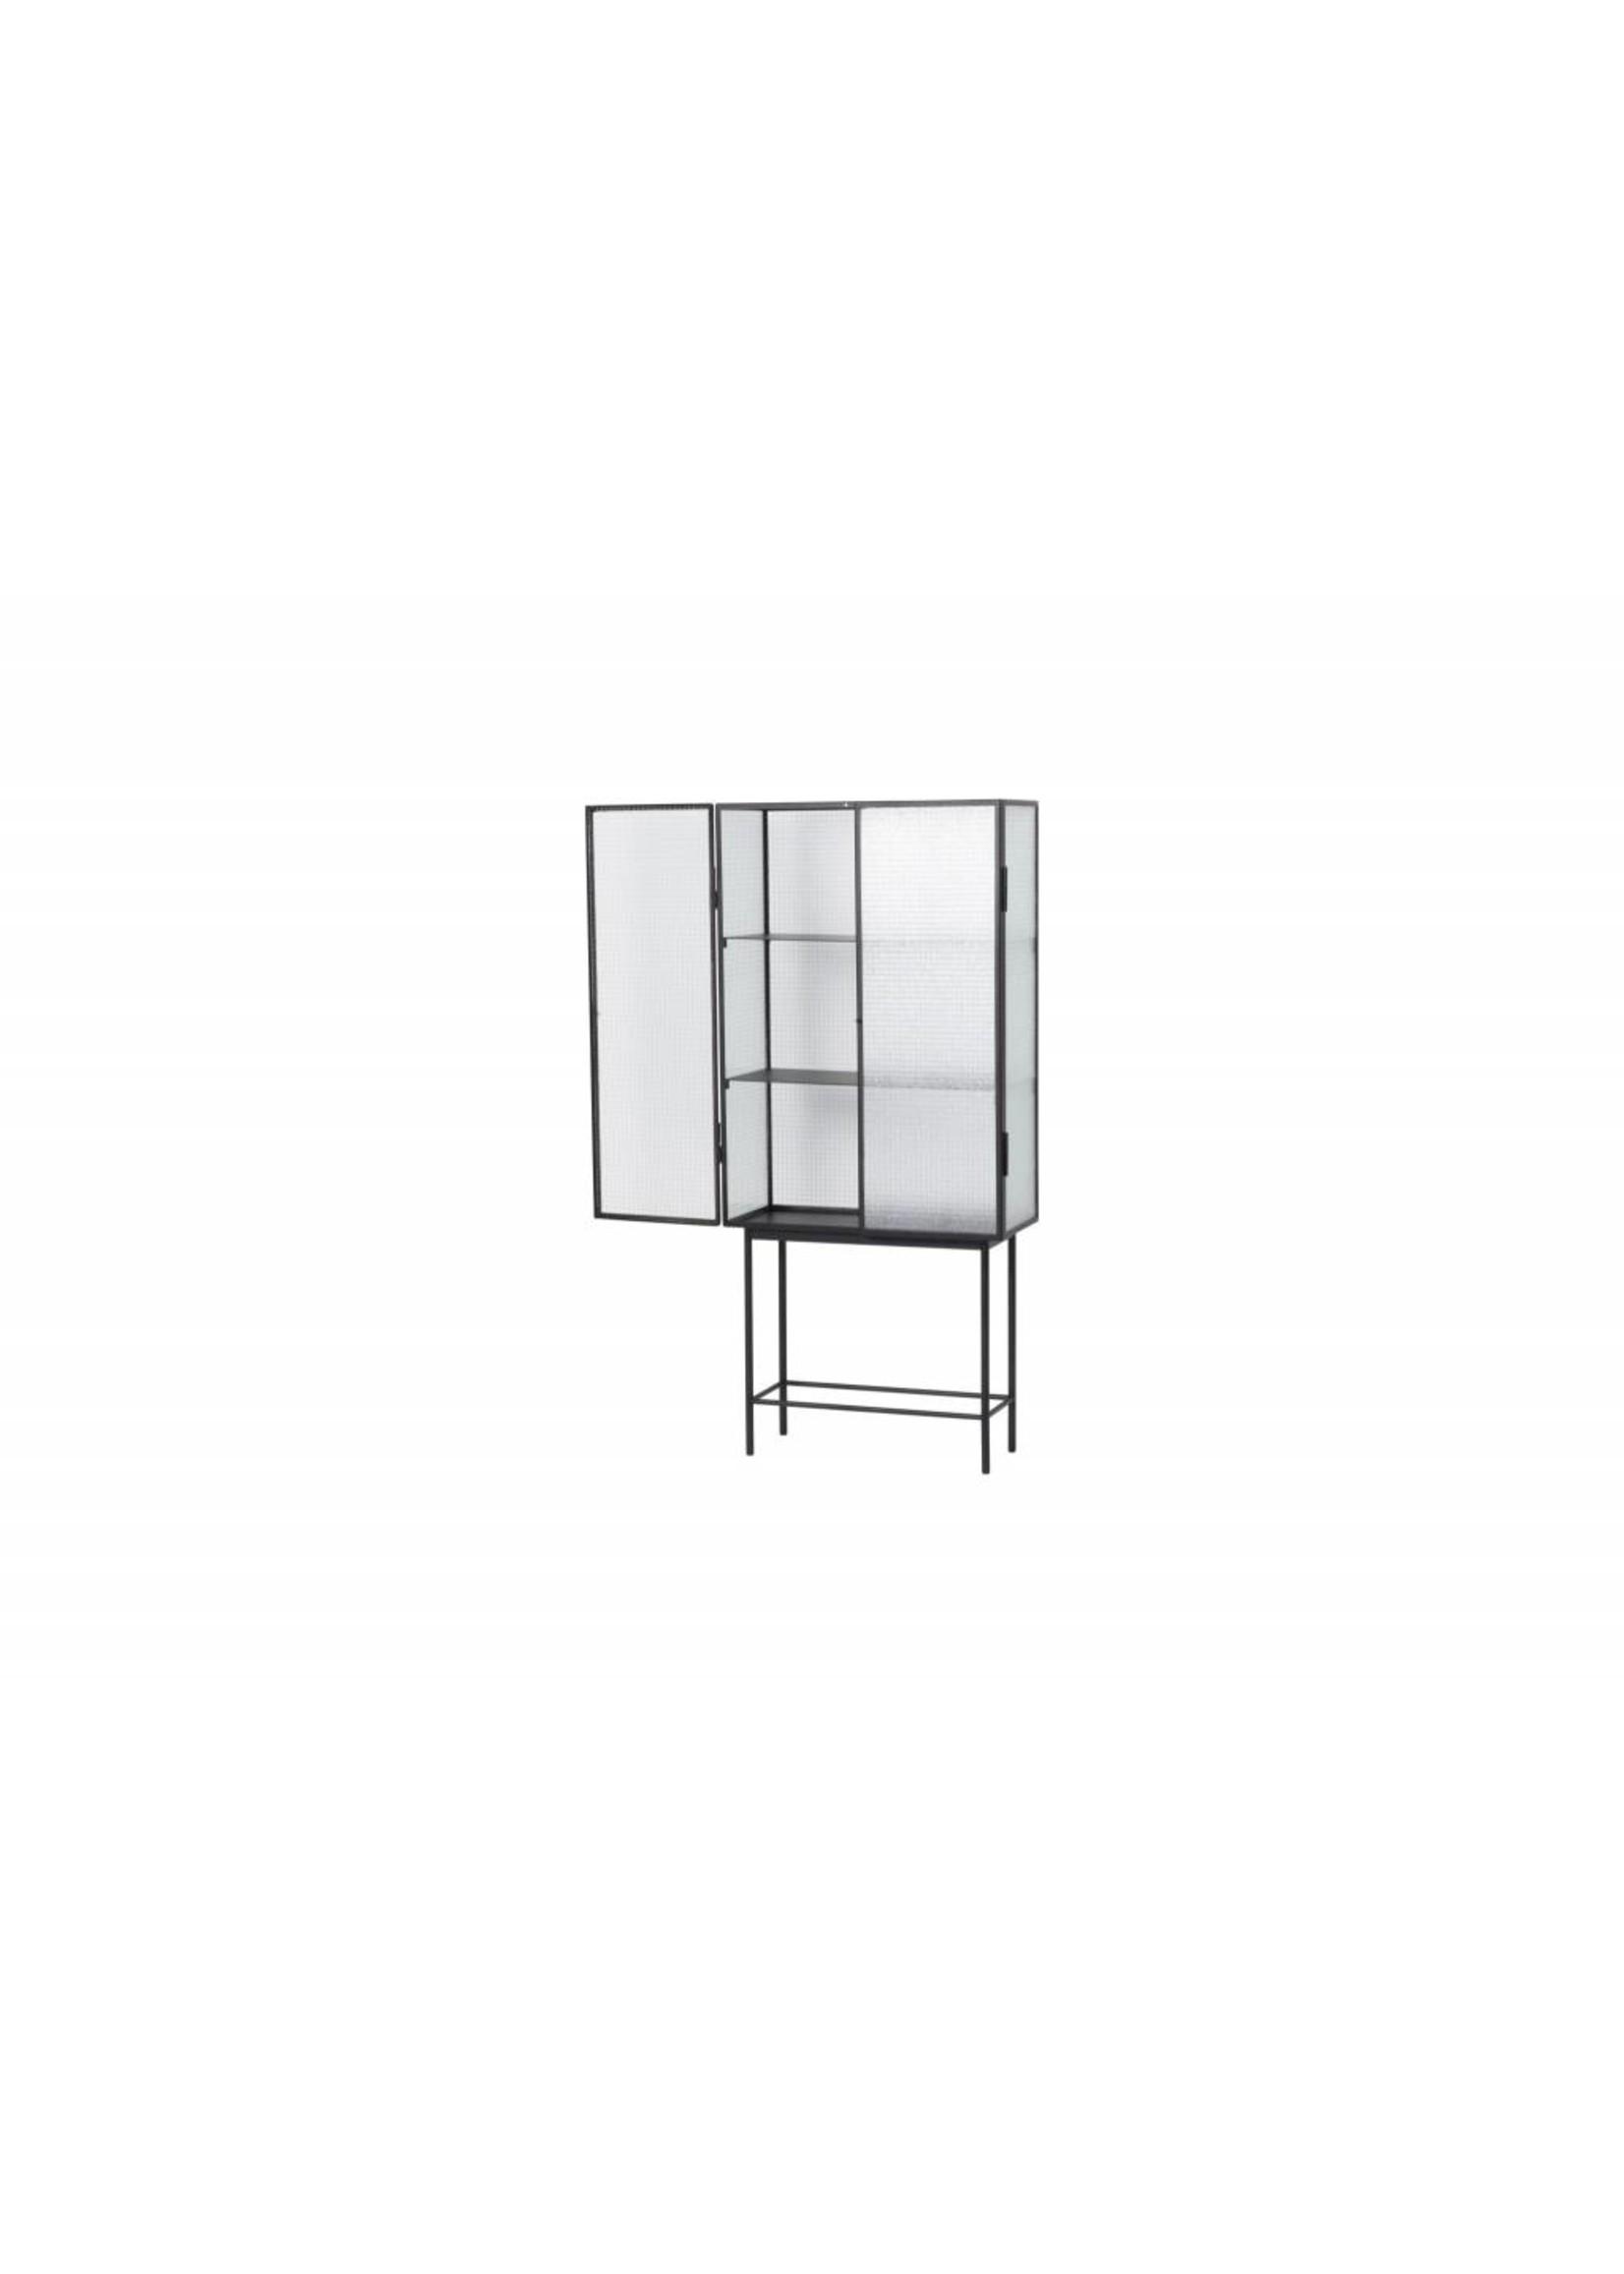 ferm LIVING Ferm Living Haze Vitrine Cabinet - Wired Glass